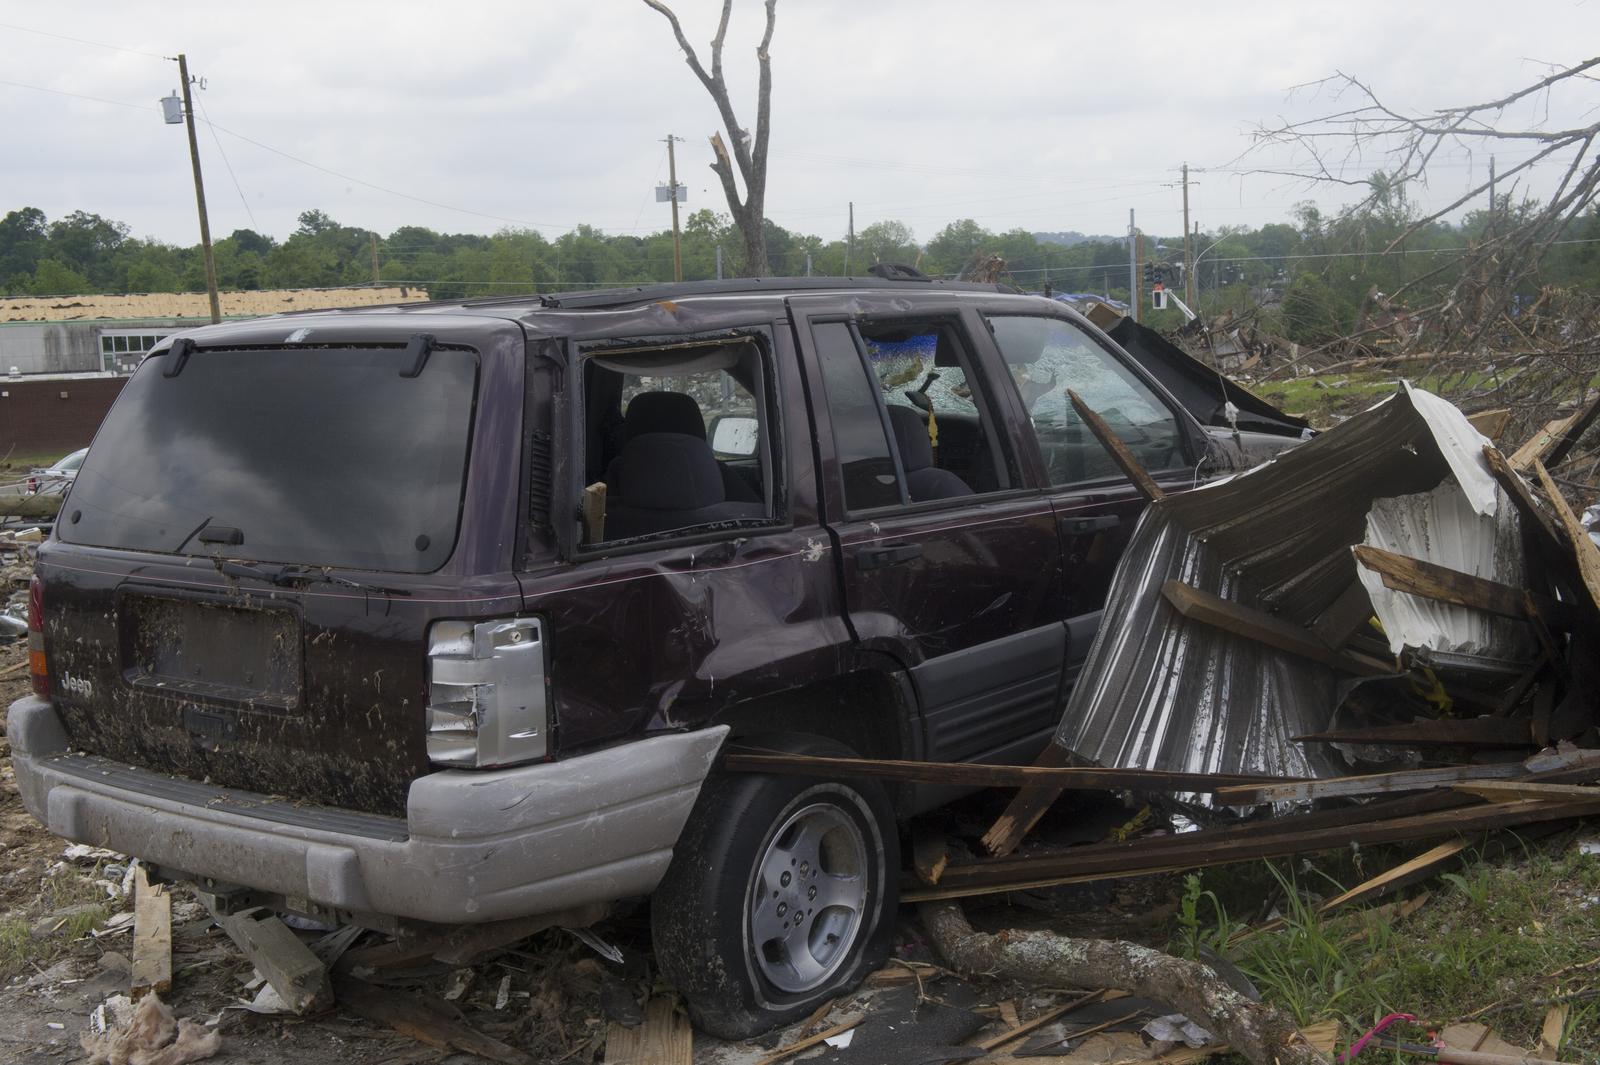 Damage, from Tuscaloosa-Birmingham, Alabama tornado, [viewed by Secretary Shaun Donovan during visit to the state]